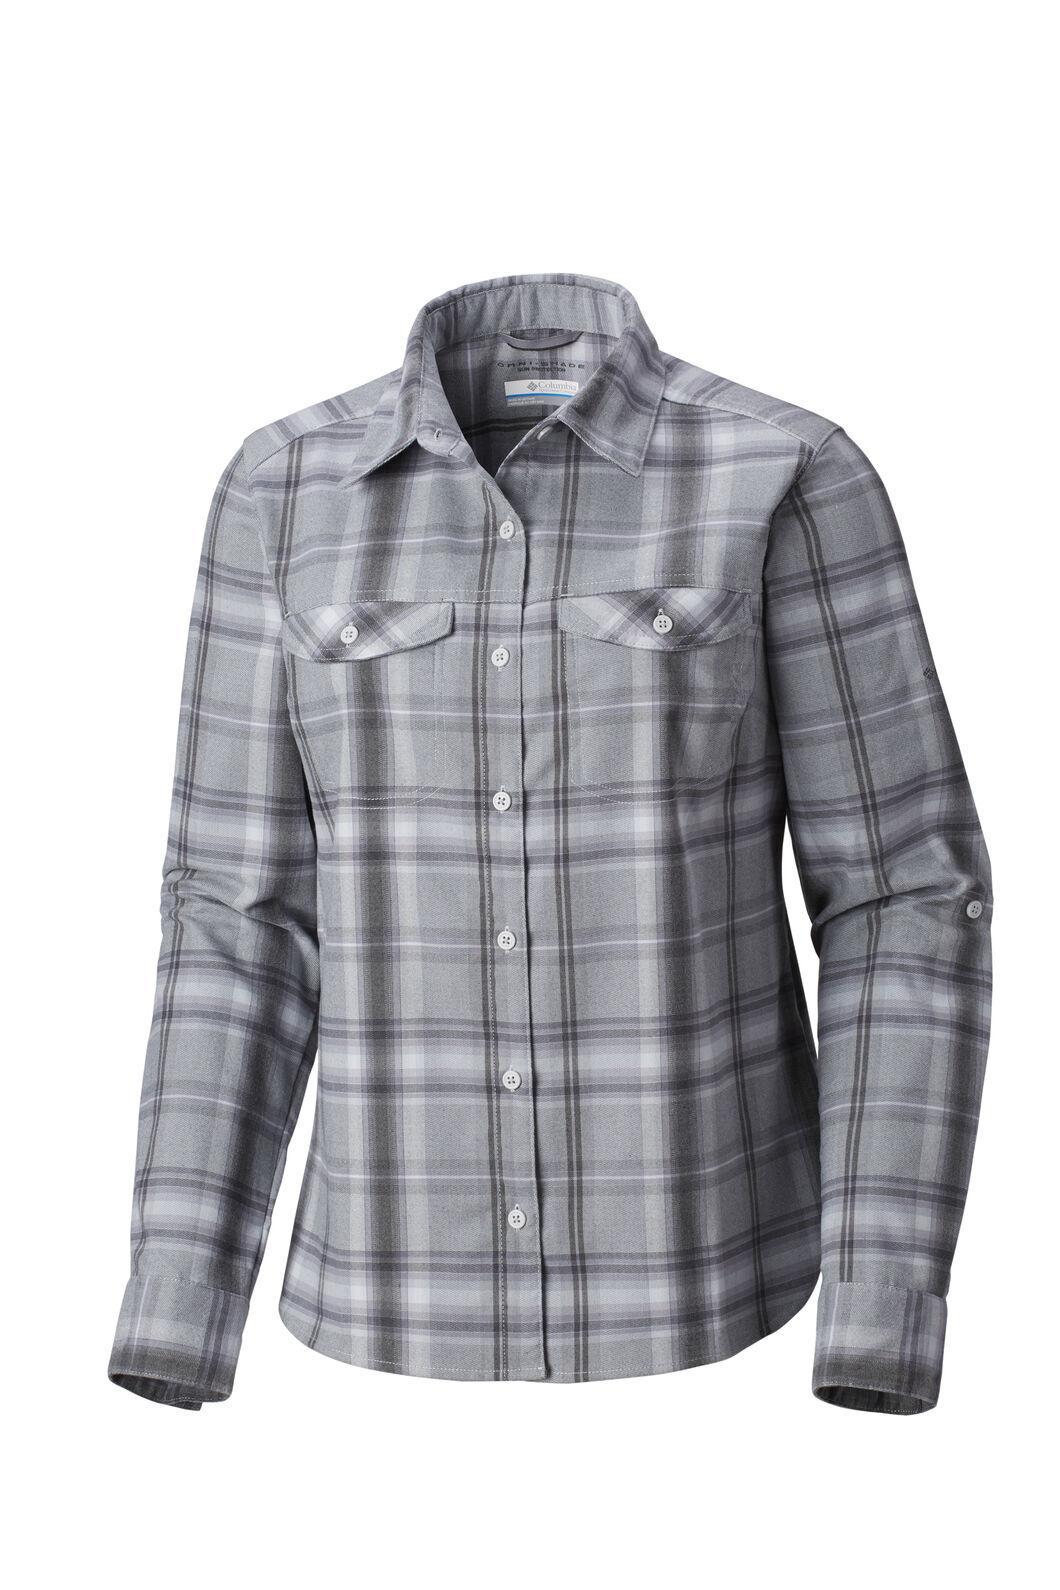 Columbia Silver Ridge Long Sleeve Flannel - Women's, Cirrus Grey, hi-res